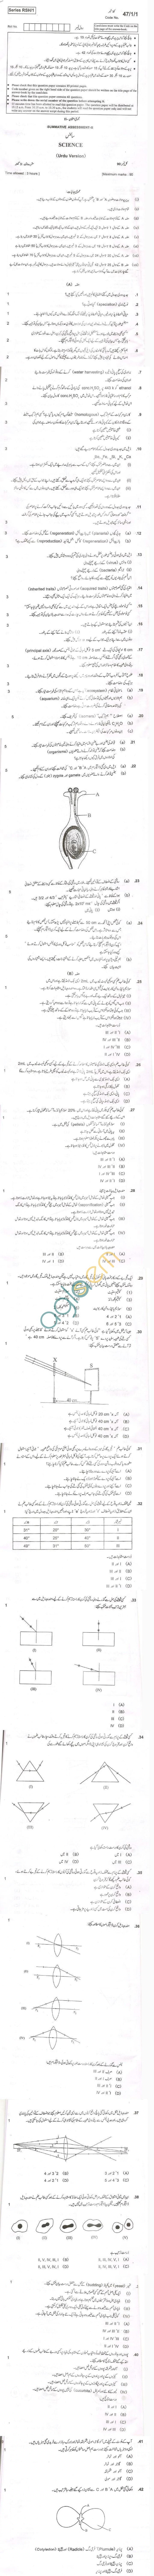 CBSE Board Exam 2013 Class X Question Paper -Science(Urdu Version)